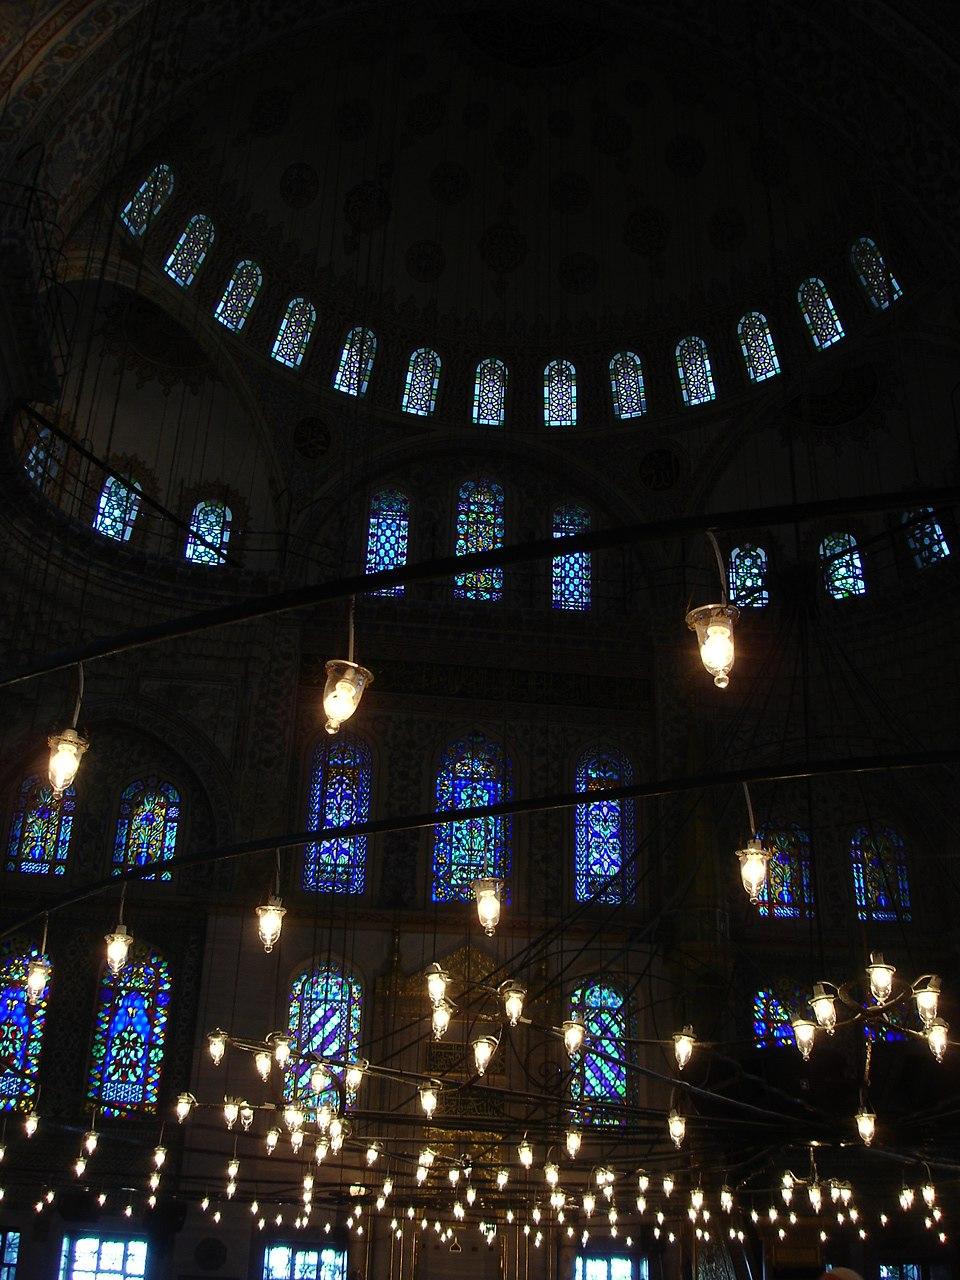 DSC04484 Istanbul - Sultan Ahmet camii (Moschea blu) - Foto G. Dall'Orto 28-5-2006